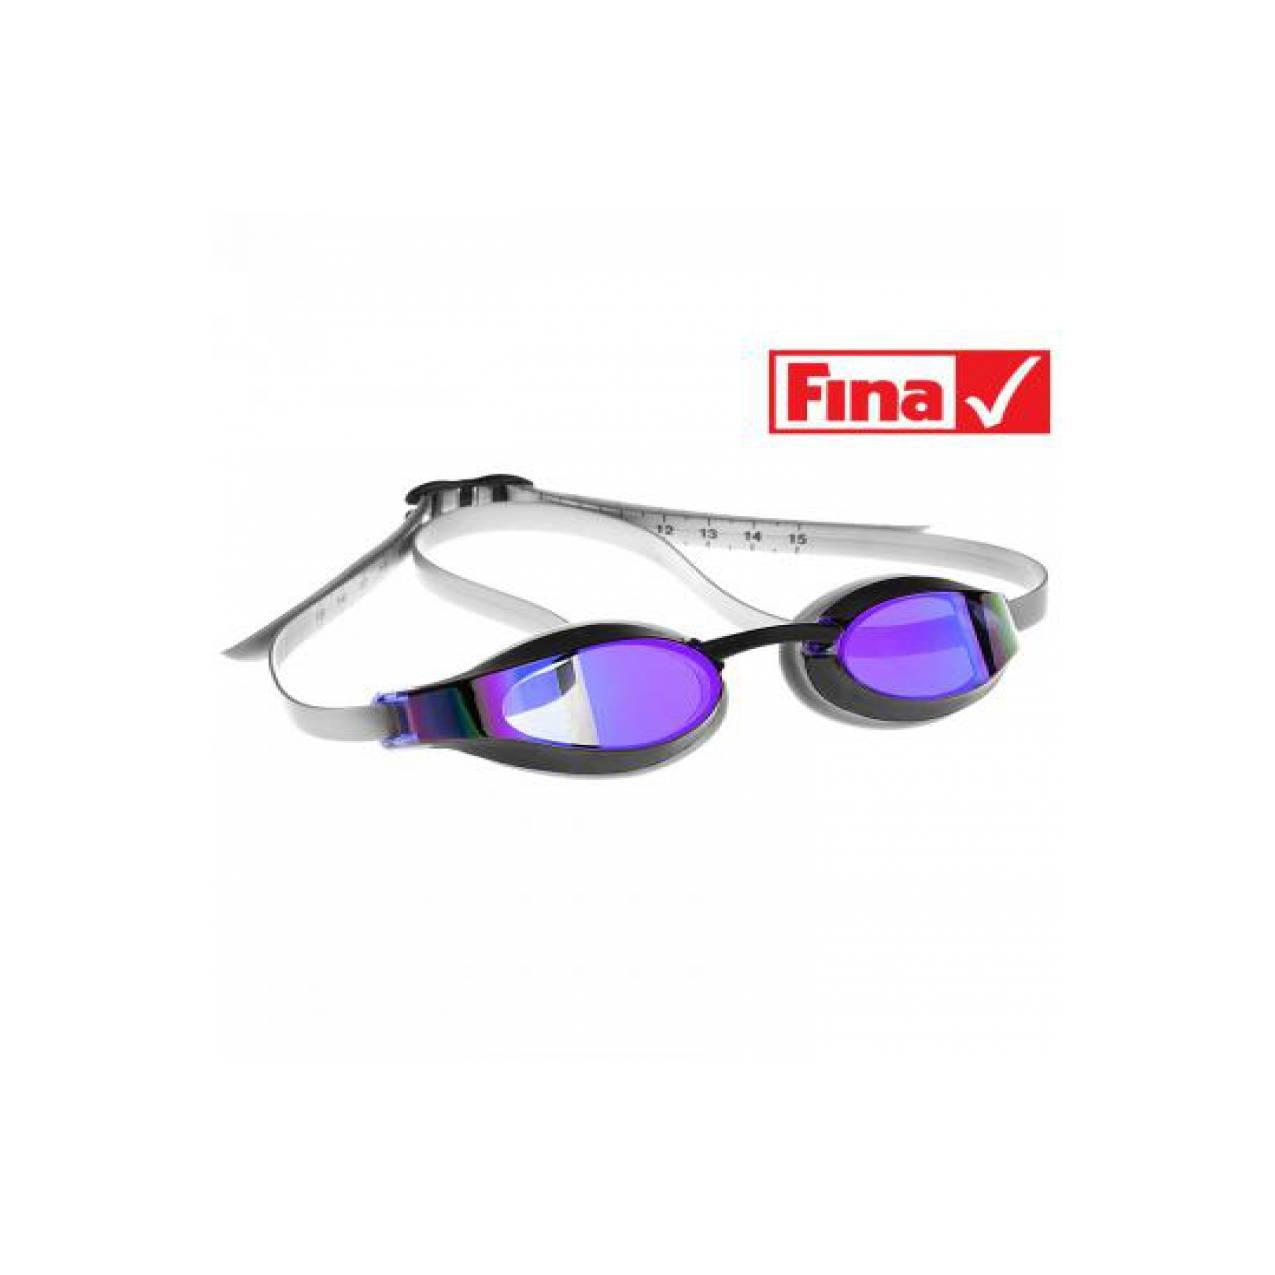 Speedo Kacamata Renang Minus 15 - Daftar Harga Terbaru dan Terupdate ... bbeef834e0